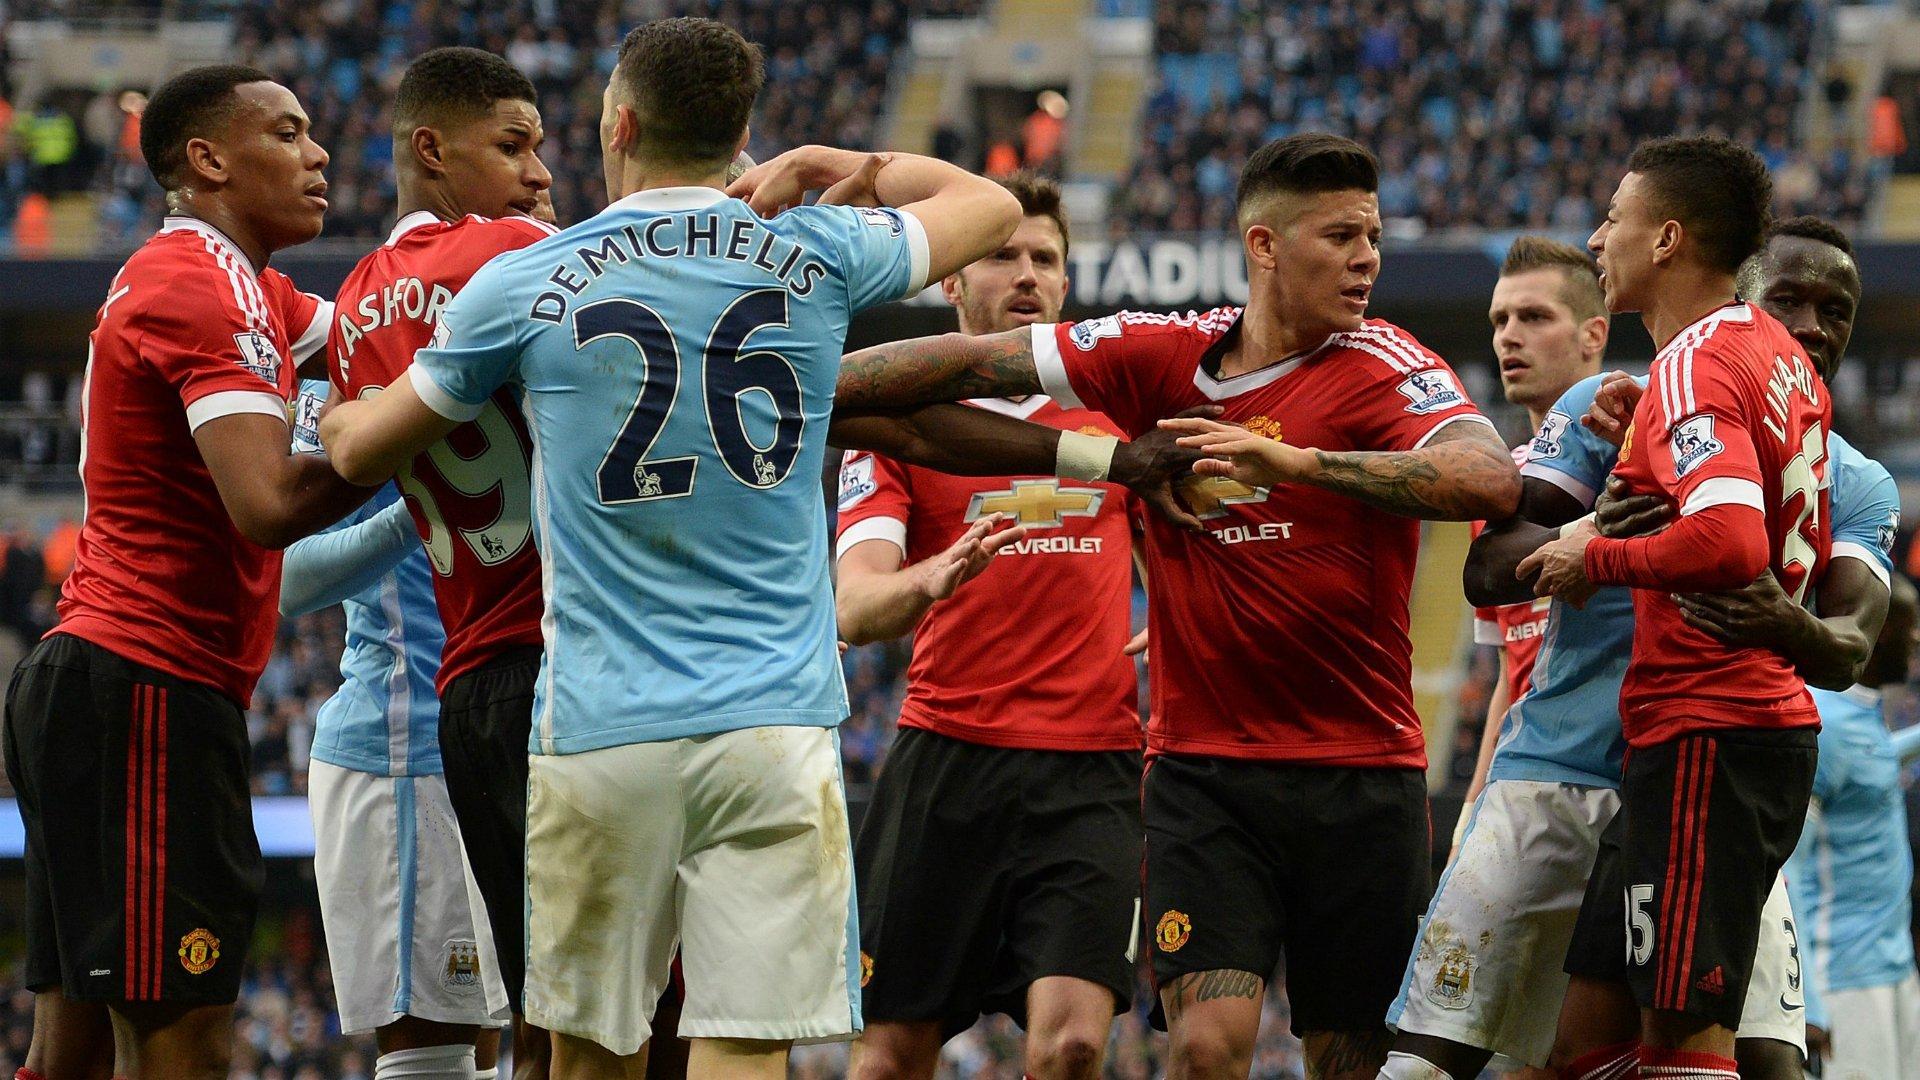 Манчестер Юнайтед – Манчестер Сити. Прогноз матча чемпионата Англии